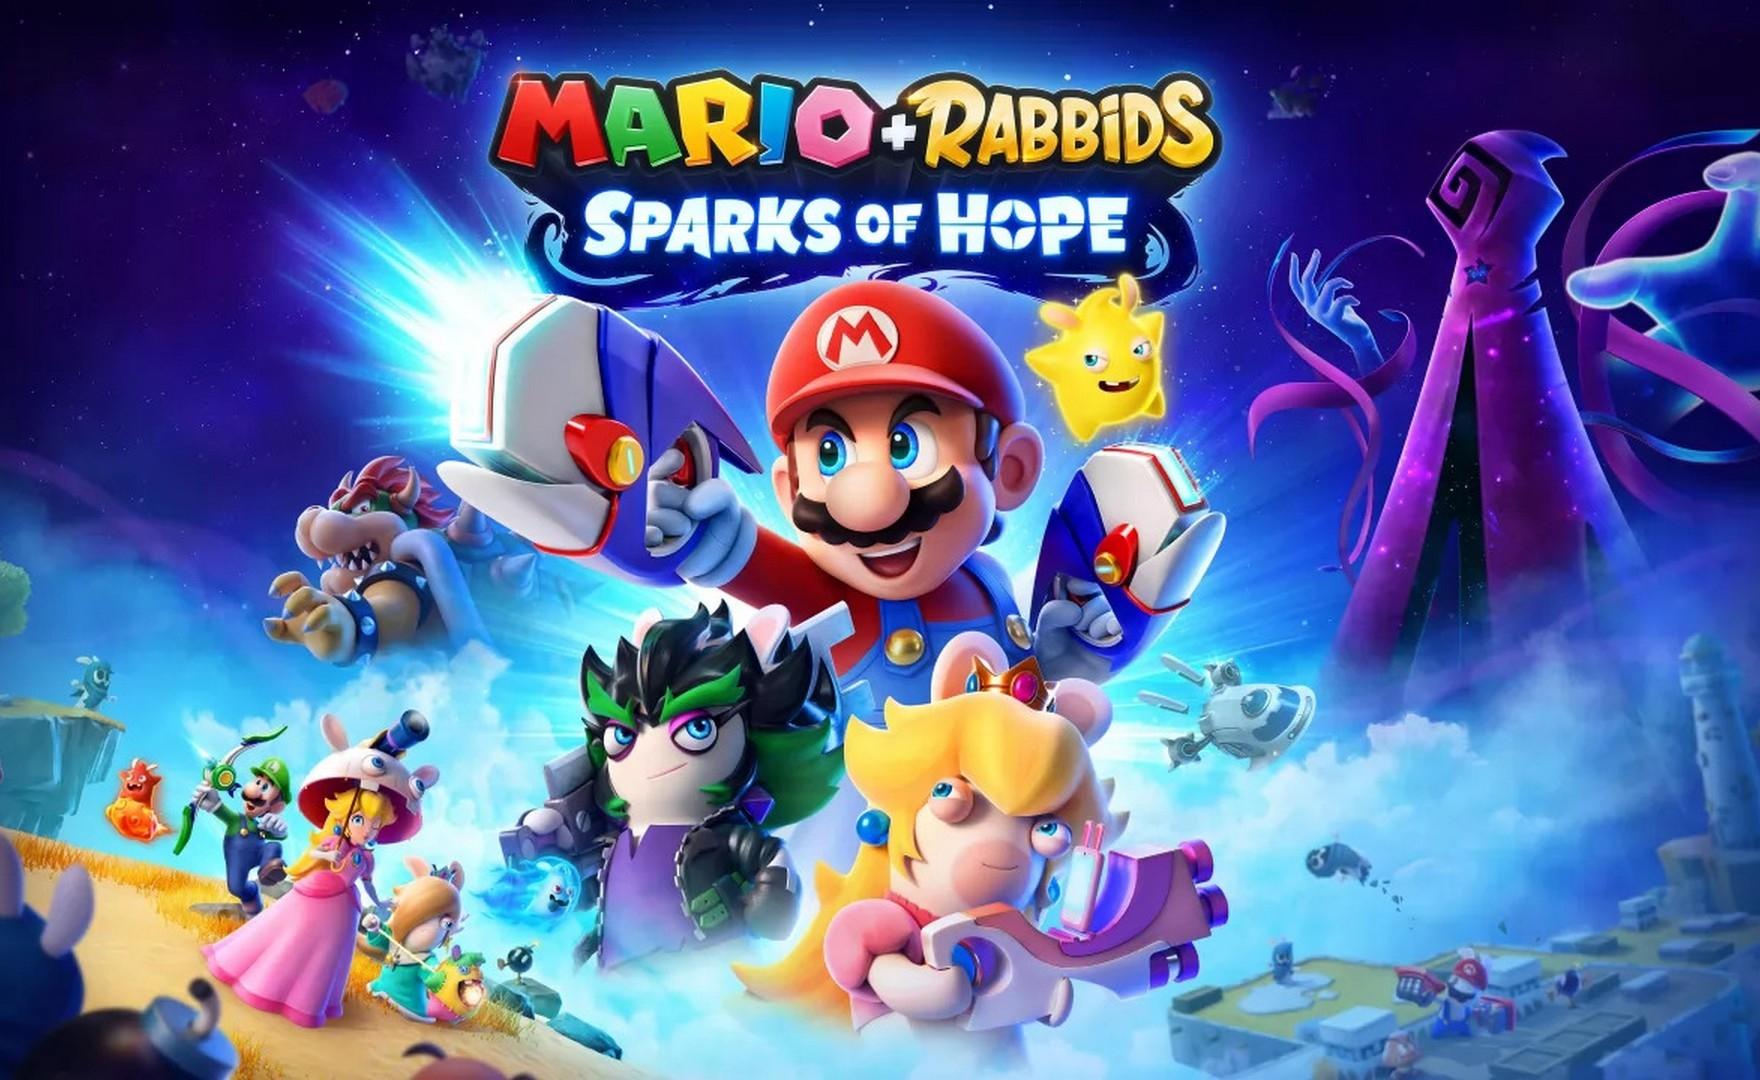 Mario + Rabbids Sparks of Hope, si mostra in un coloratissimo trailer